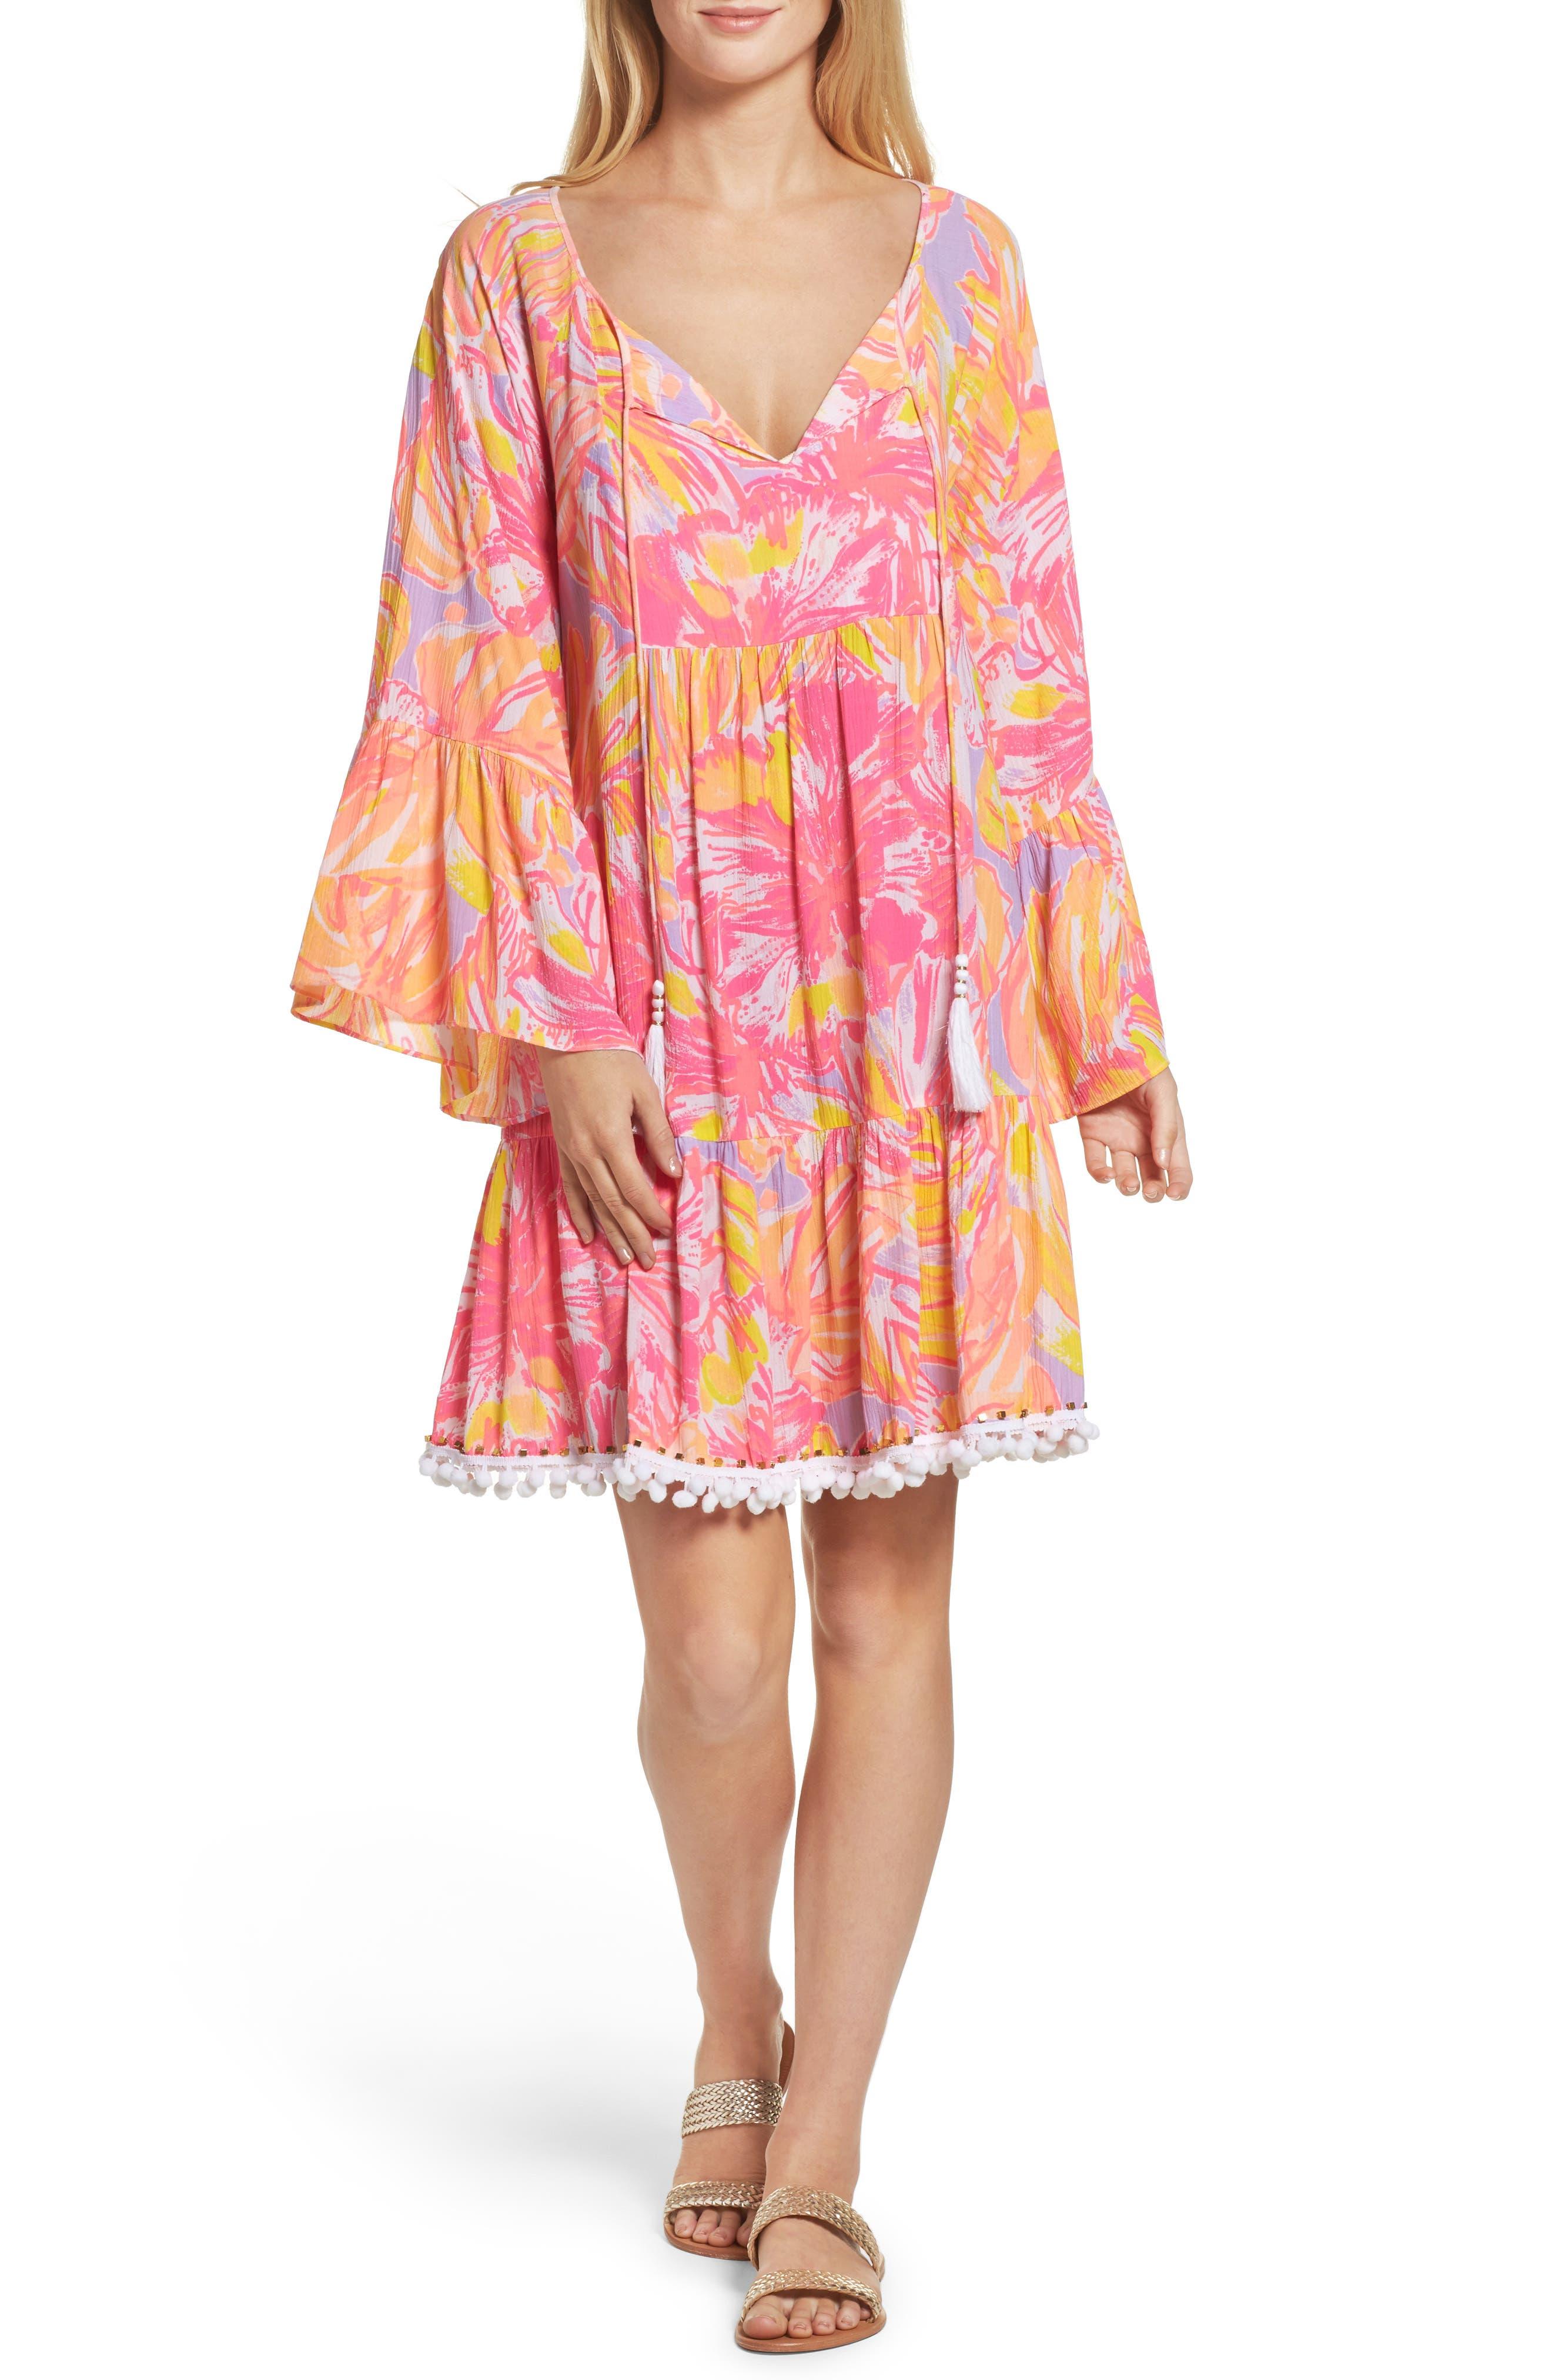 Main Image - Lilly Pulitzer® Amisa Tunic Dress